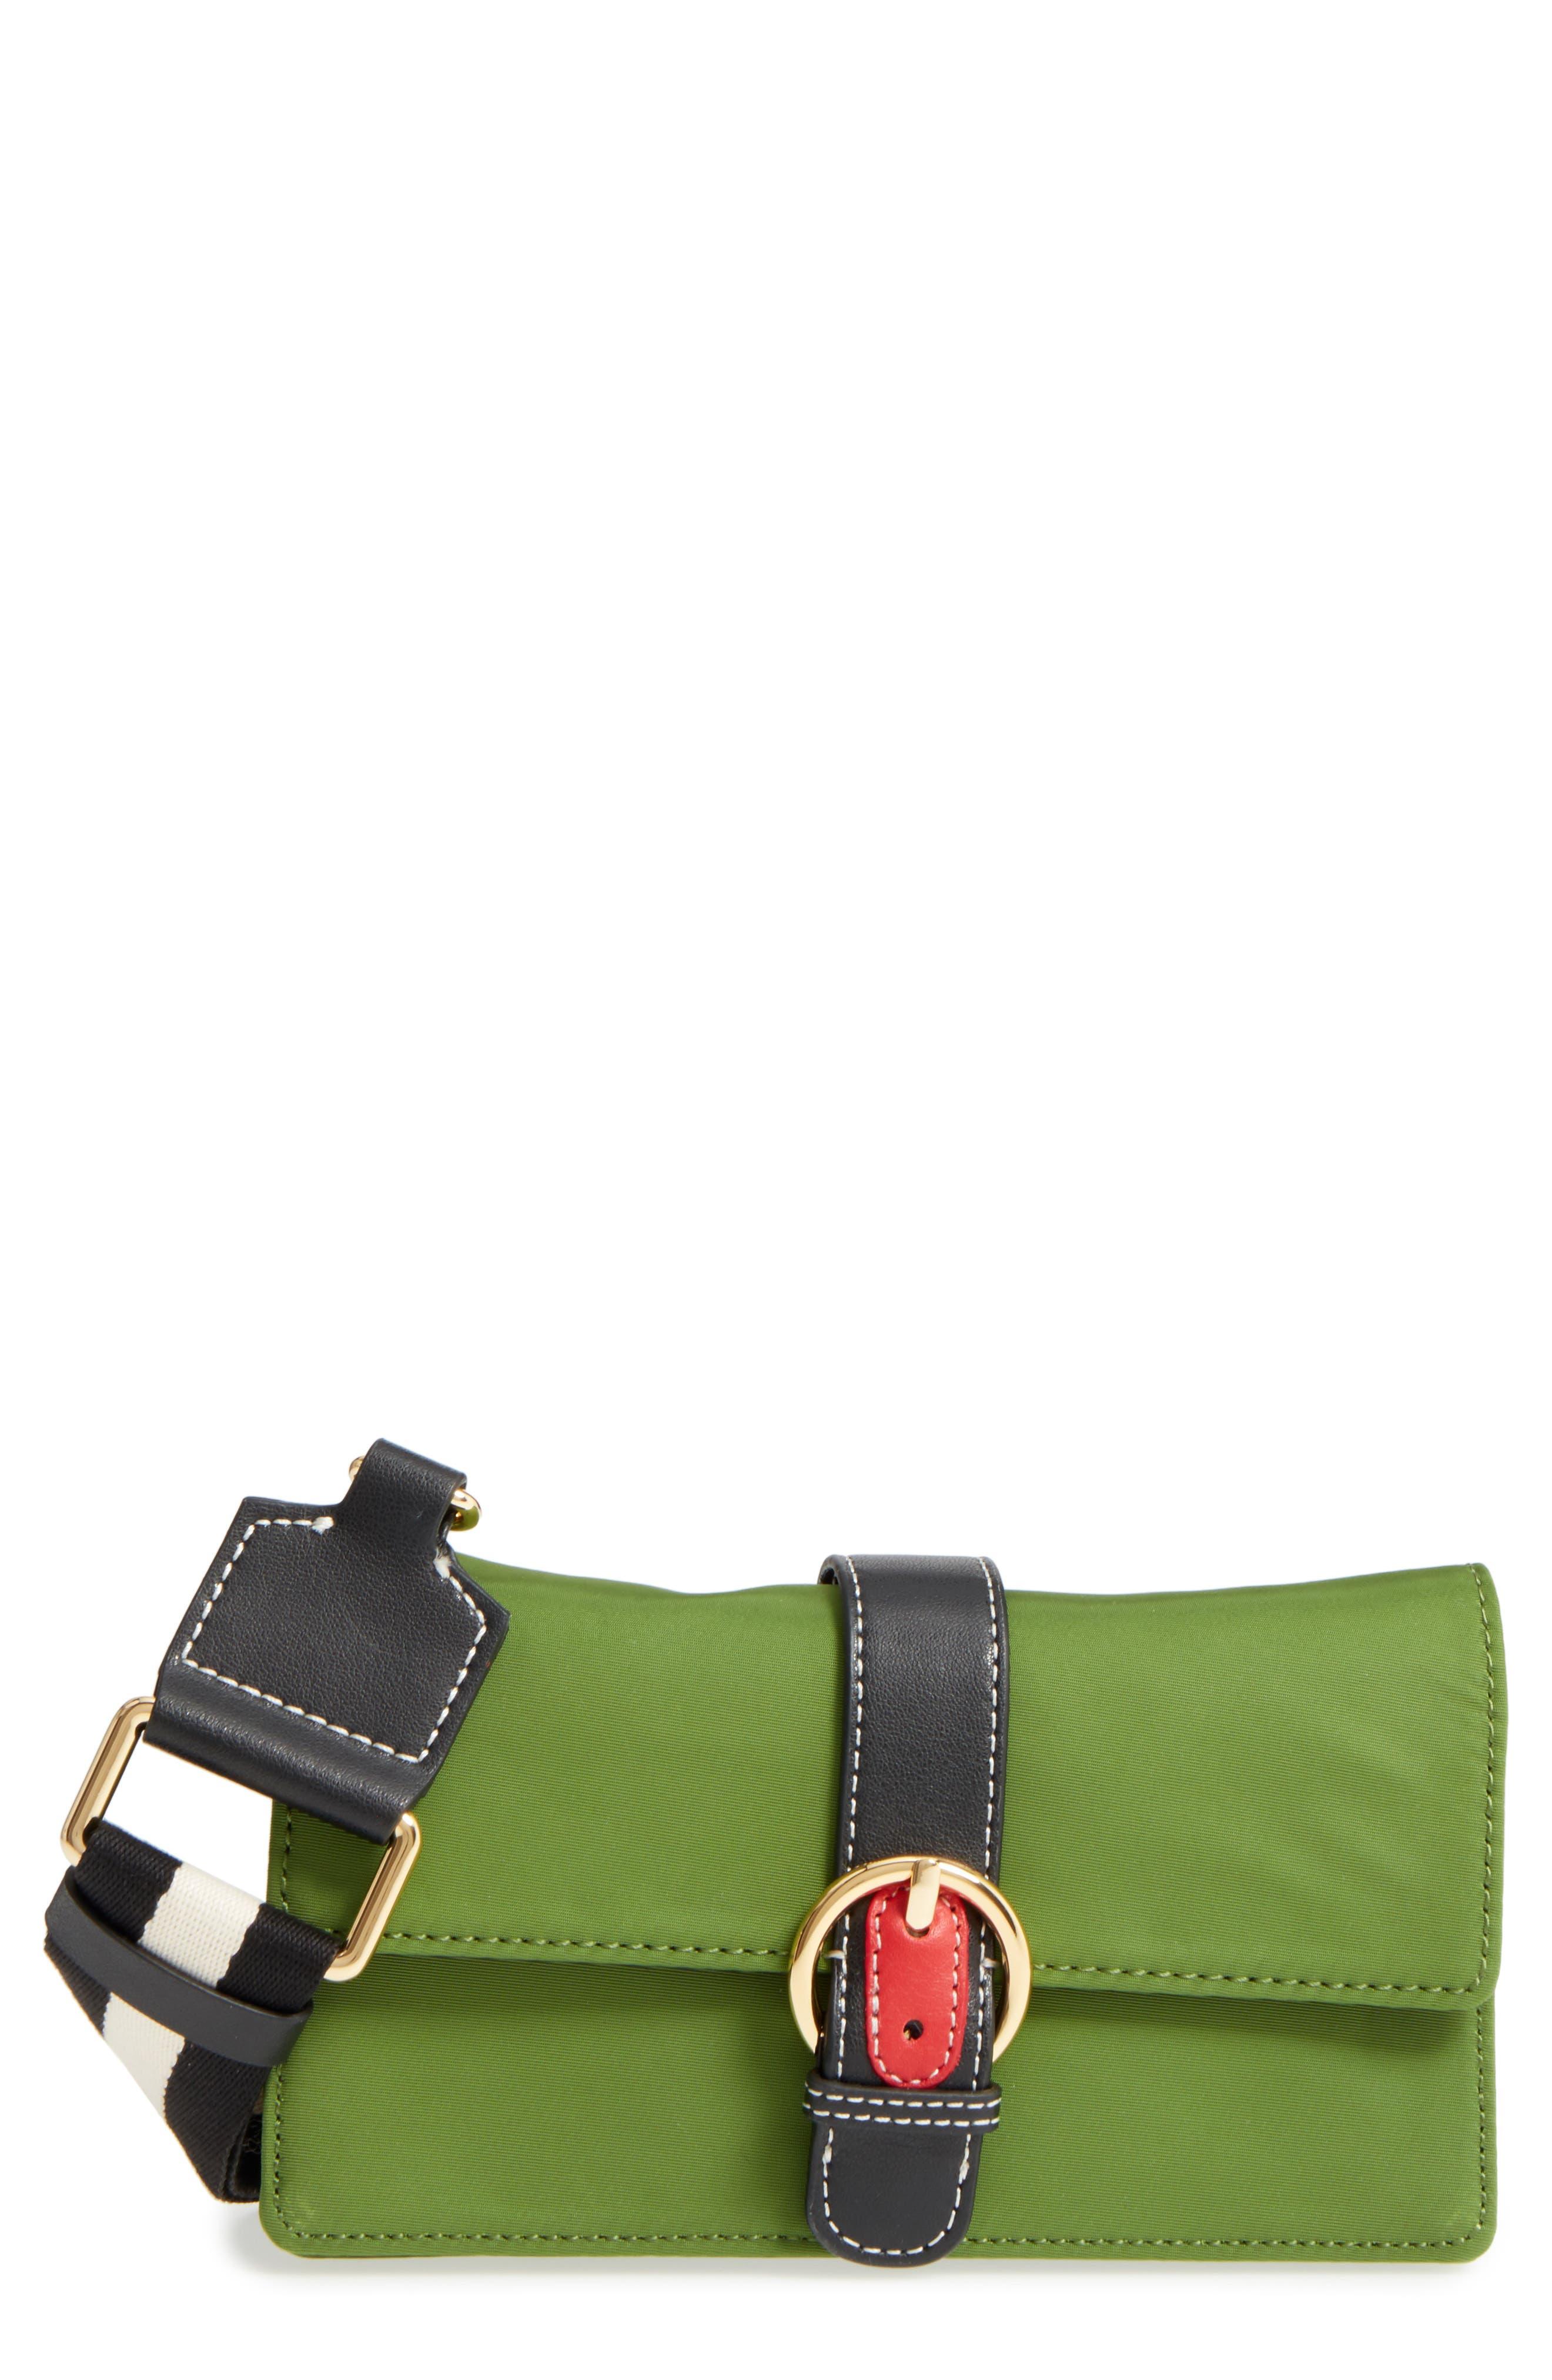 Nylon Crossbody Wallet,                             Main thumbnail 1, color,                             Grass